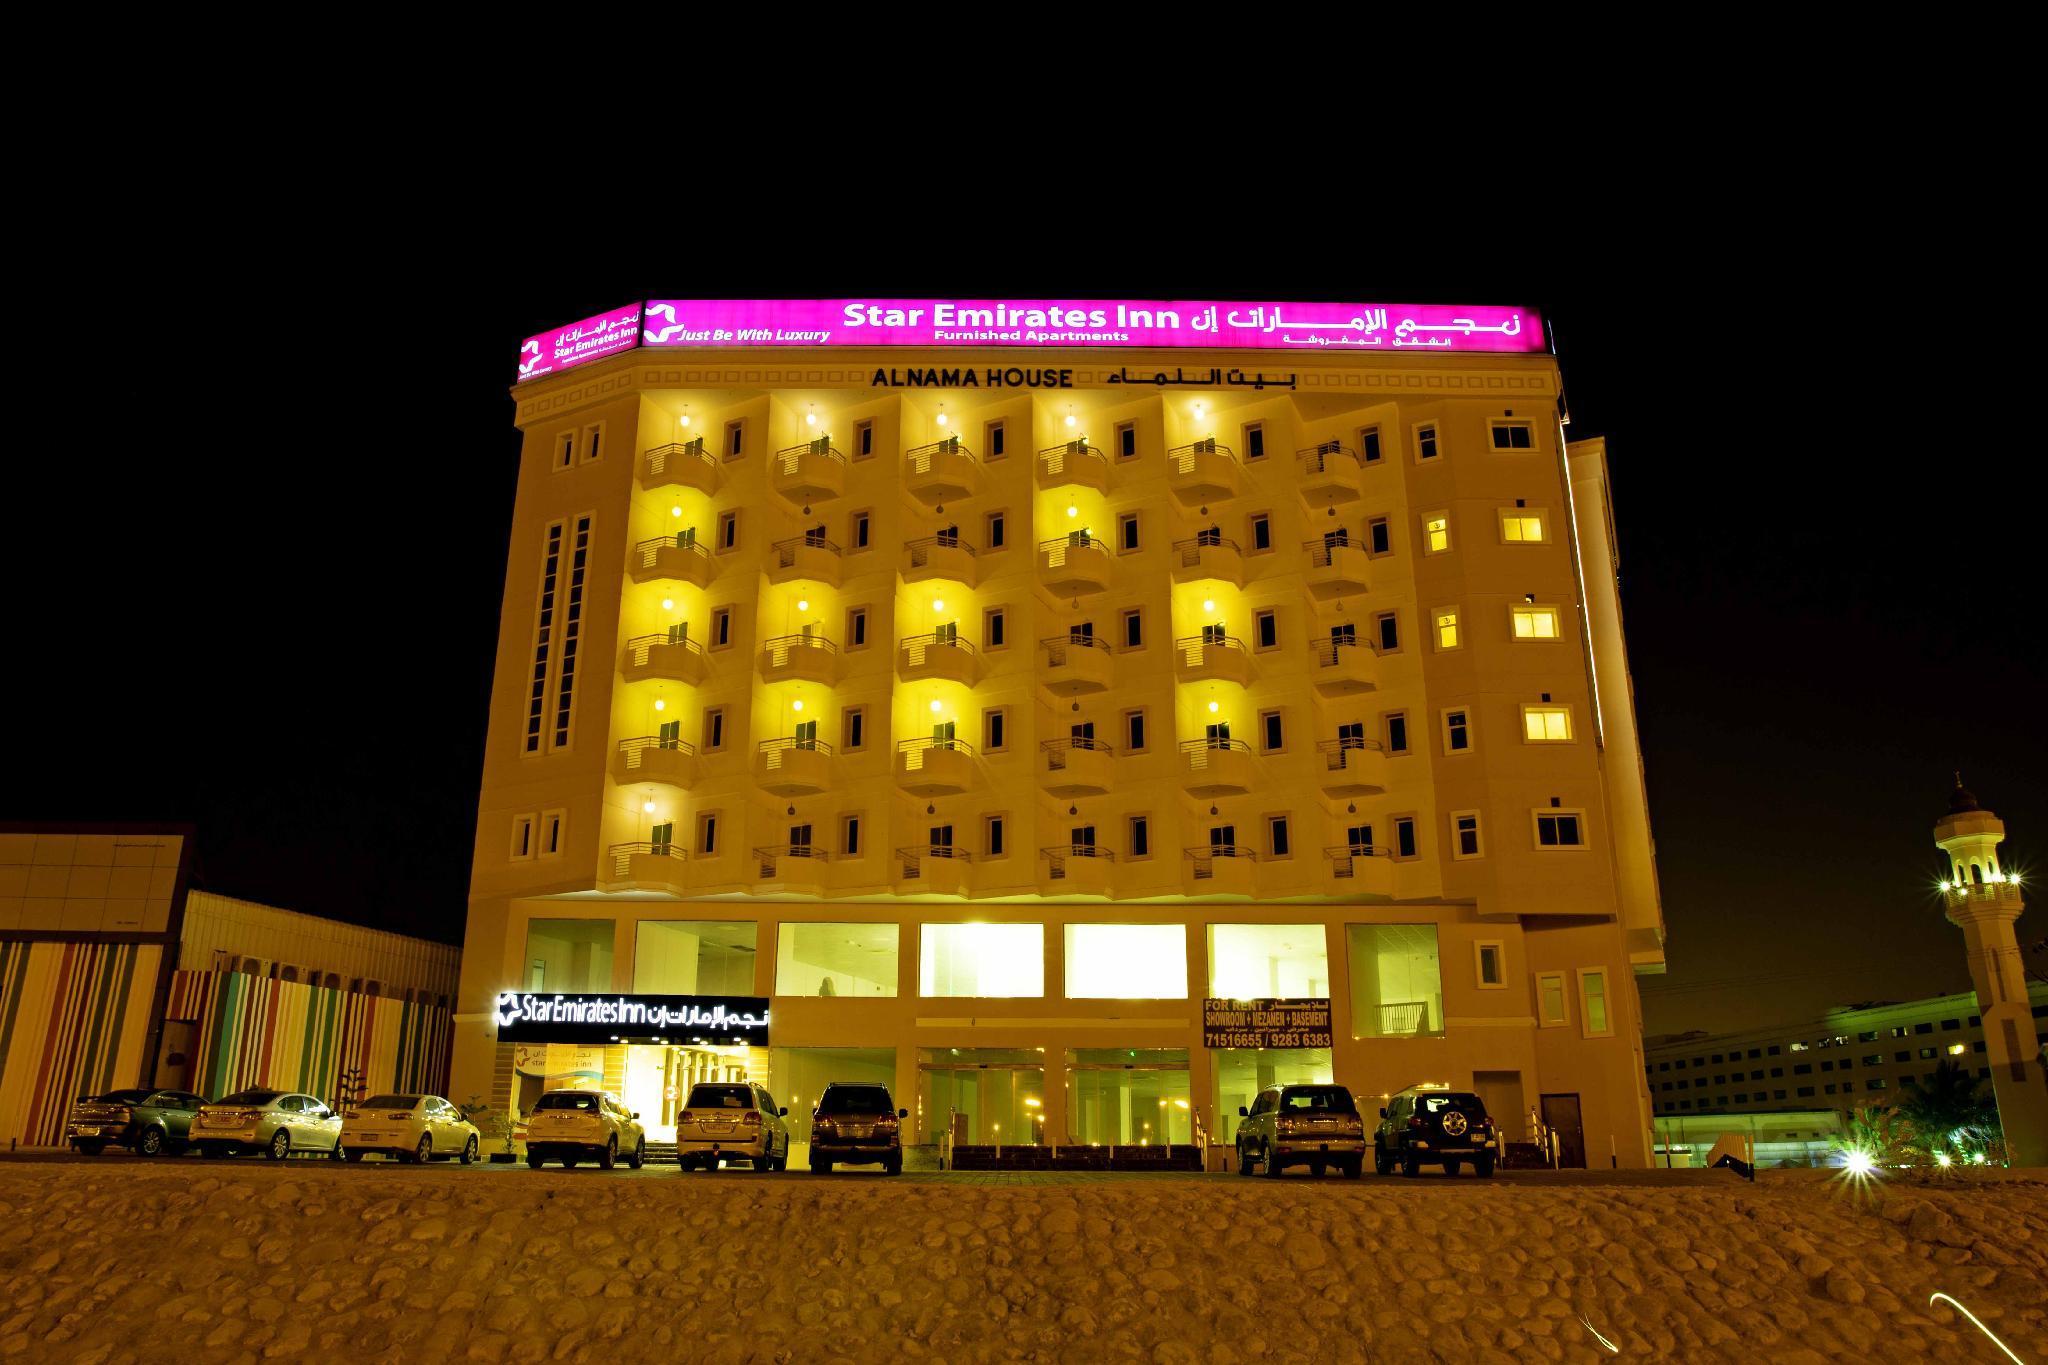 Star Emirates Inn